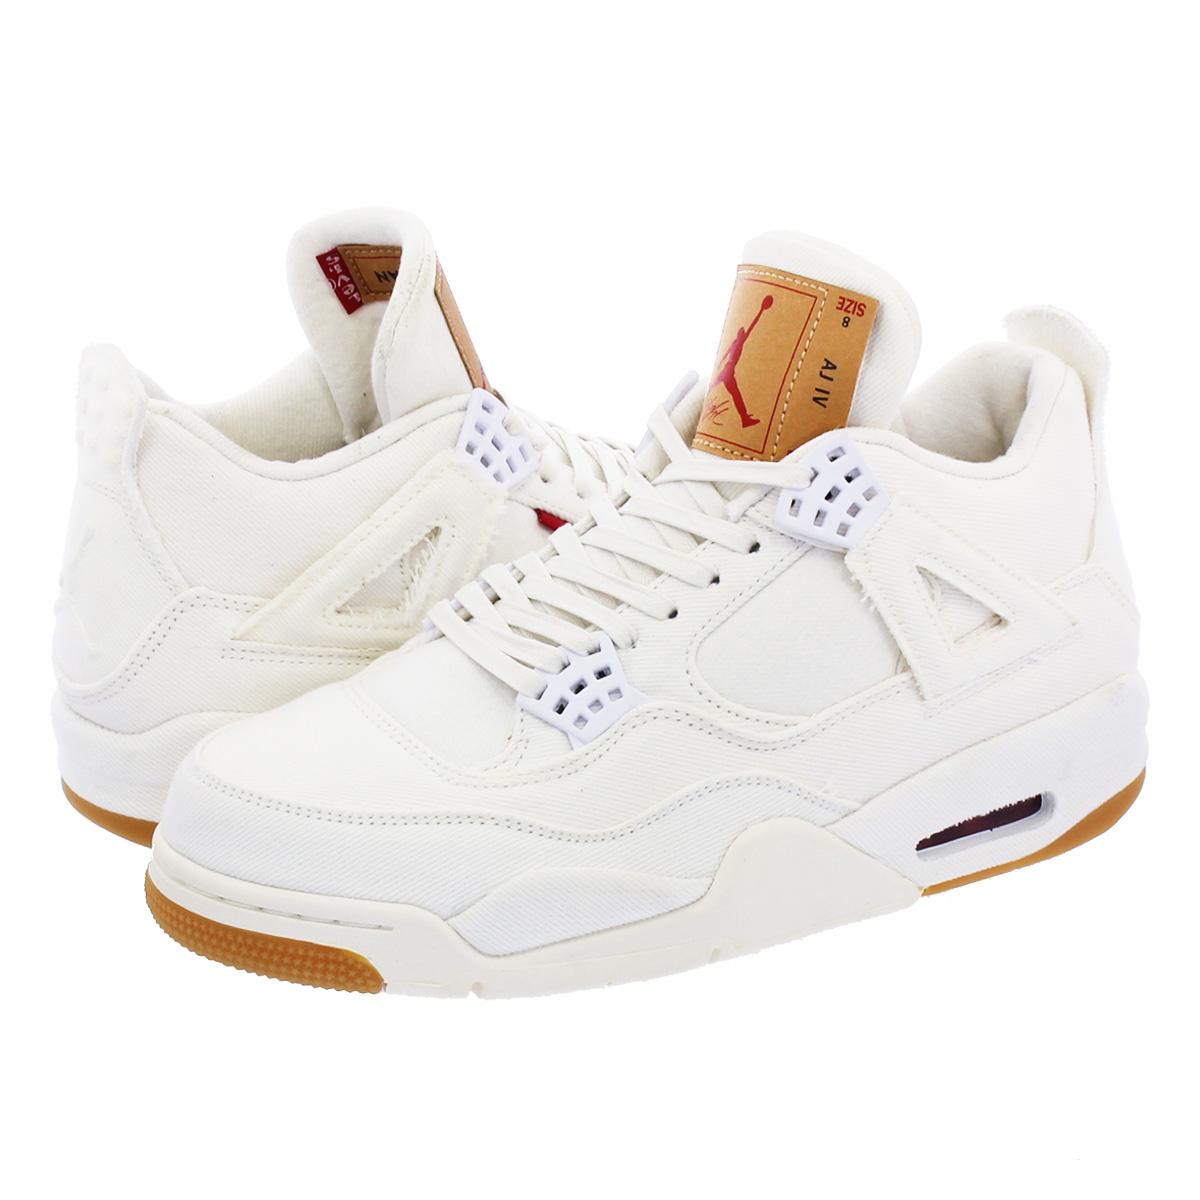 watch 3a6f3 33771 NIKE AIR JORDAN 4 RETRO NRG Nike air Jordan 4 nostalgic NRG Levis  WHITE/WHITE ao2571-100